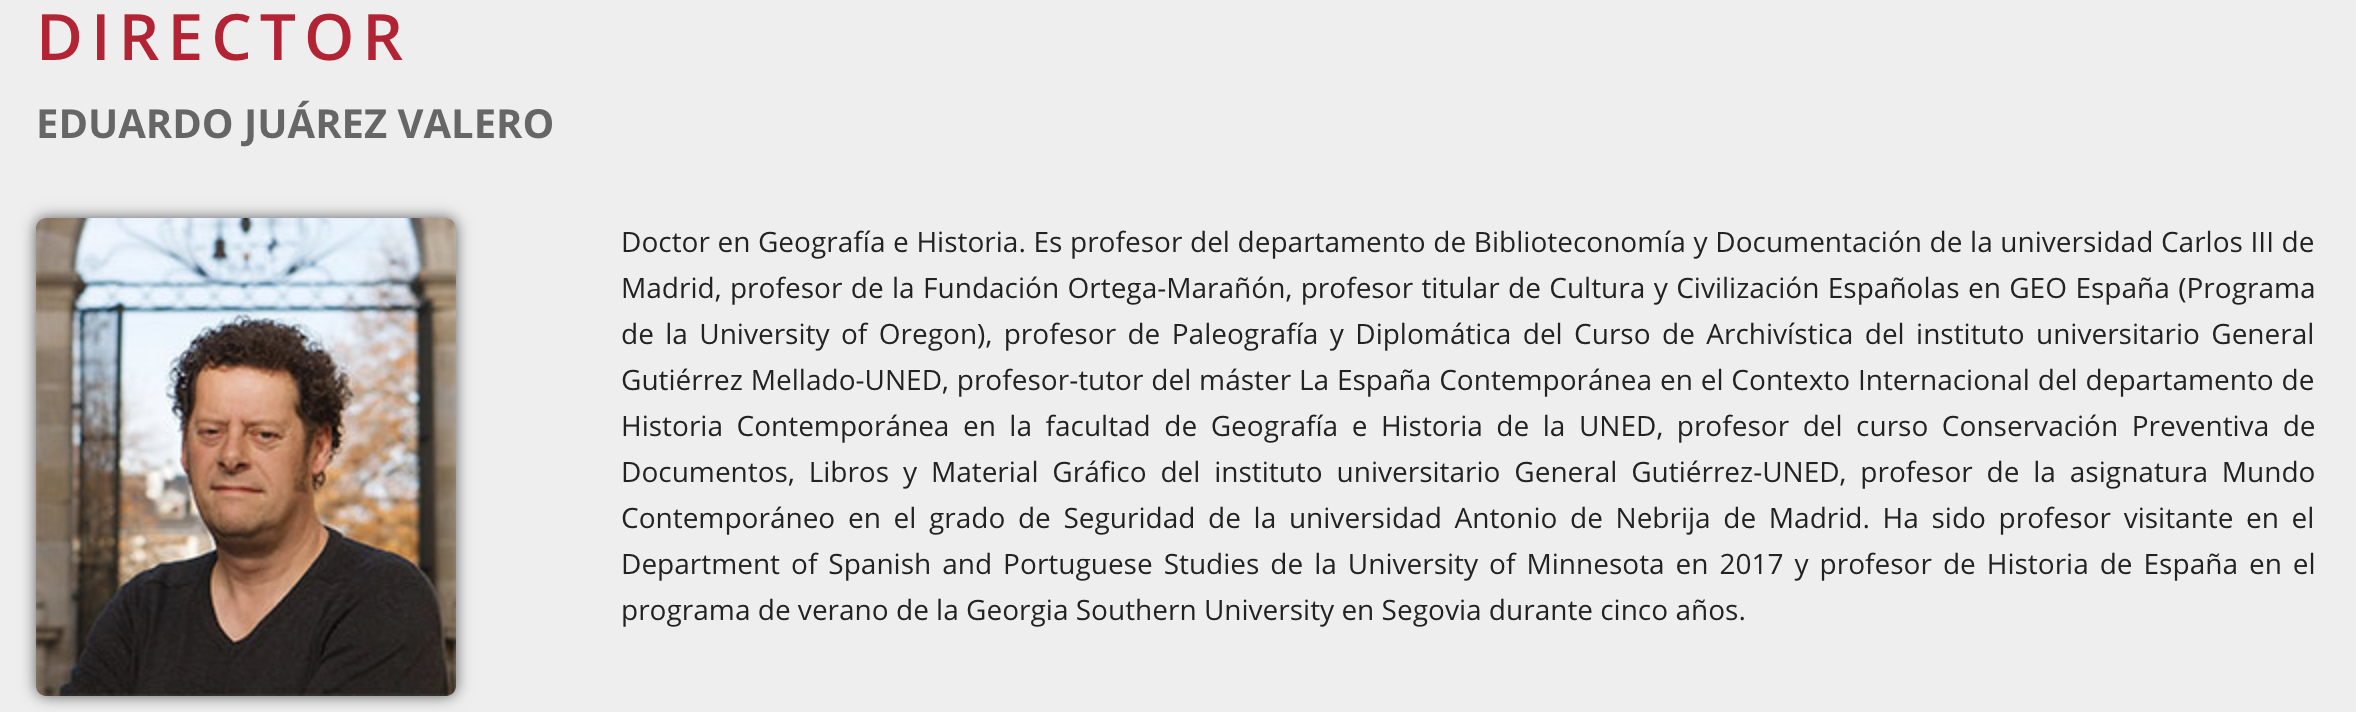 Escuela Internacional de Doctorado   INISEG 2018-12-18 19-10-42